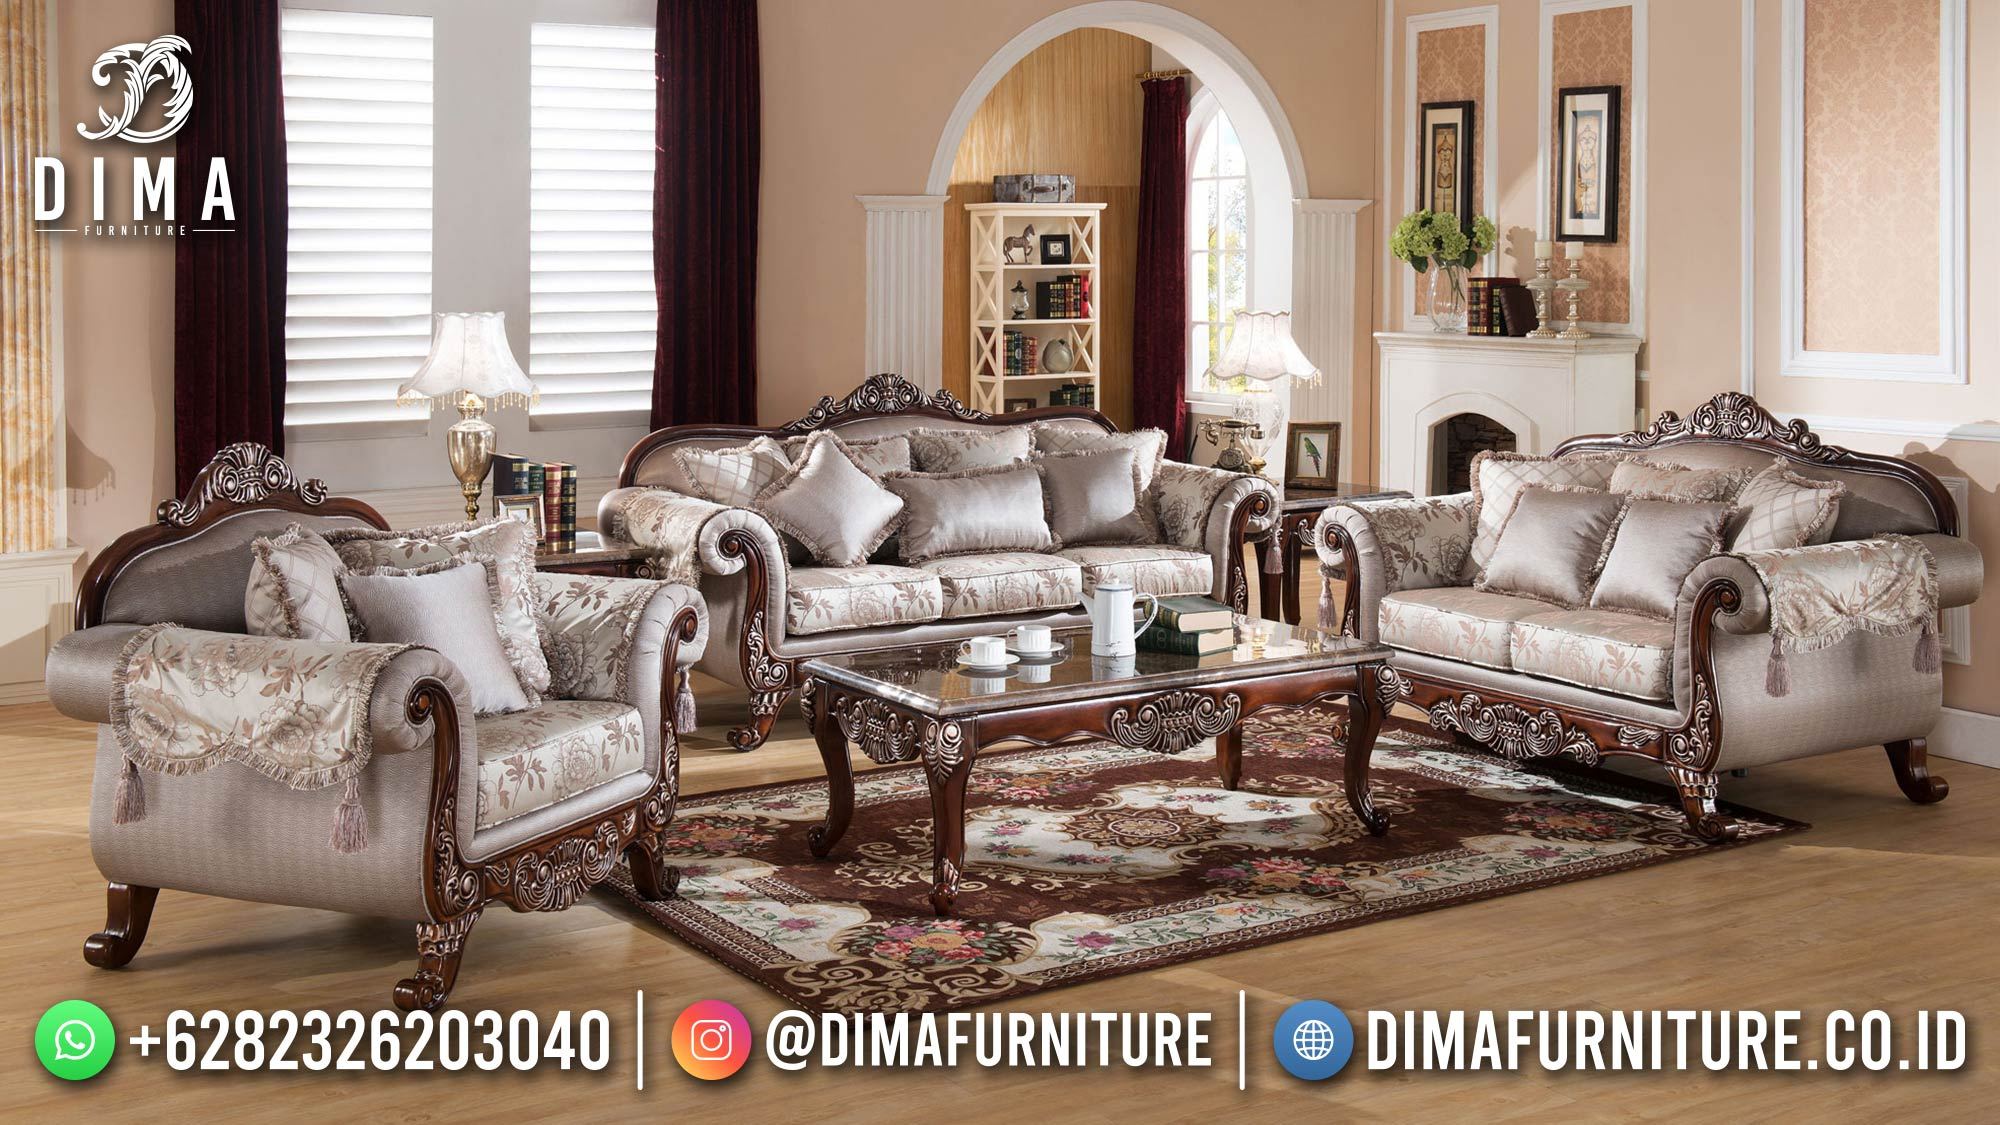 Flash Sale Sofa Tamu Mewah Luxury Design Classic 100 % High Quality ST-1434